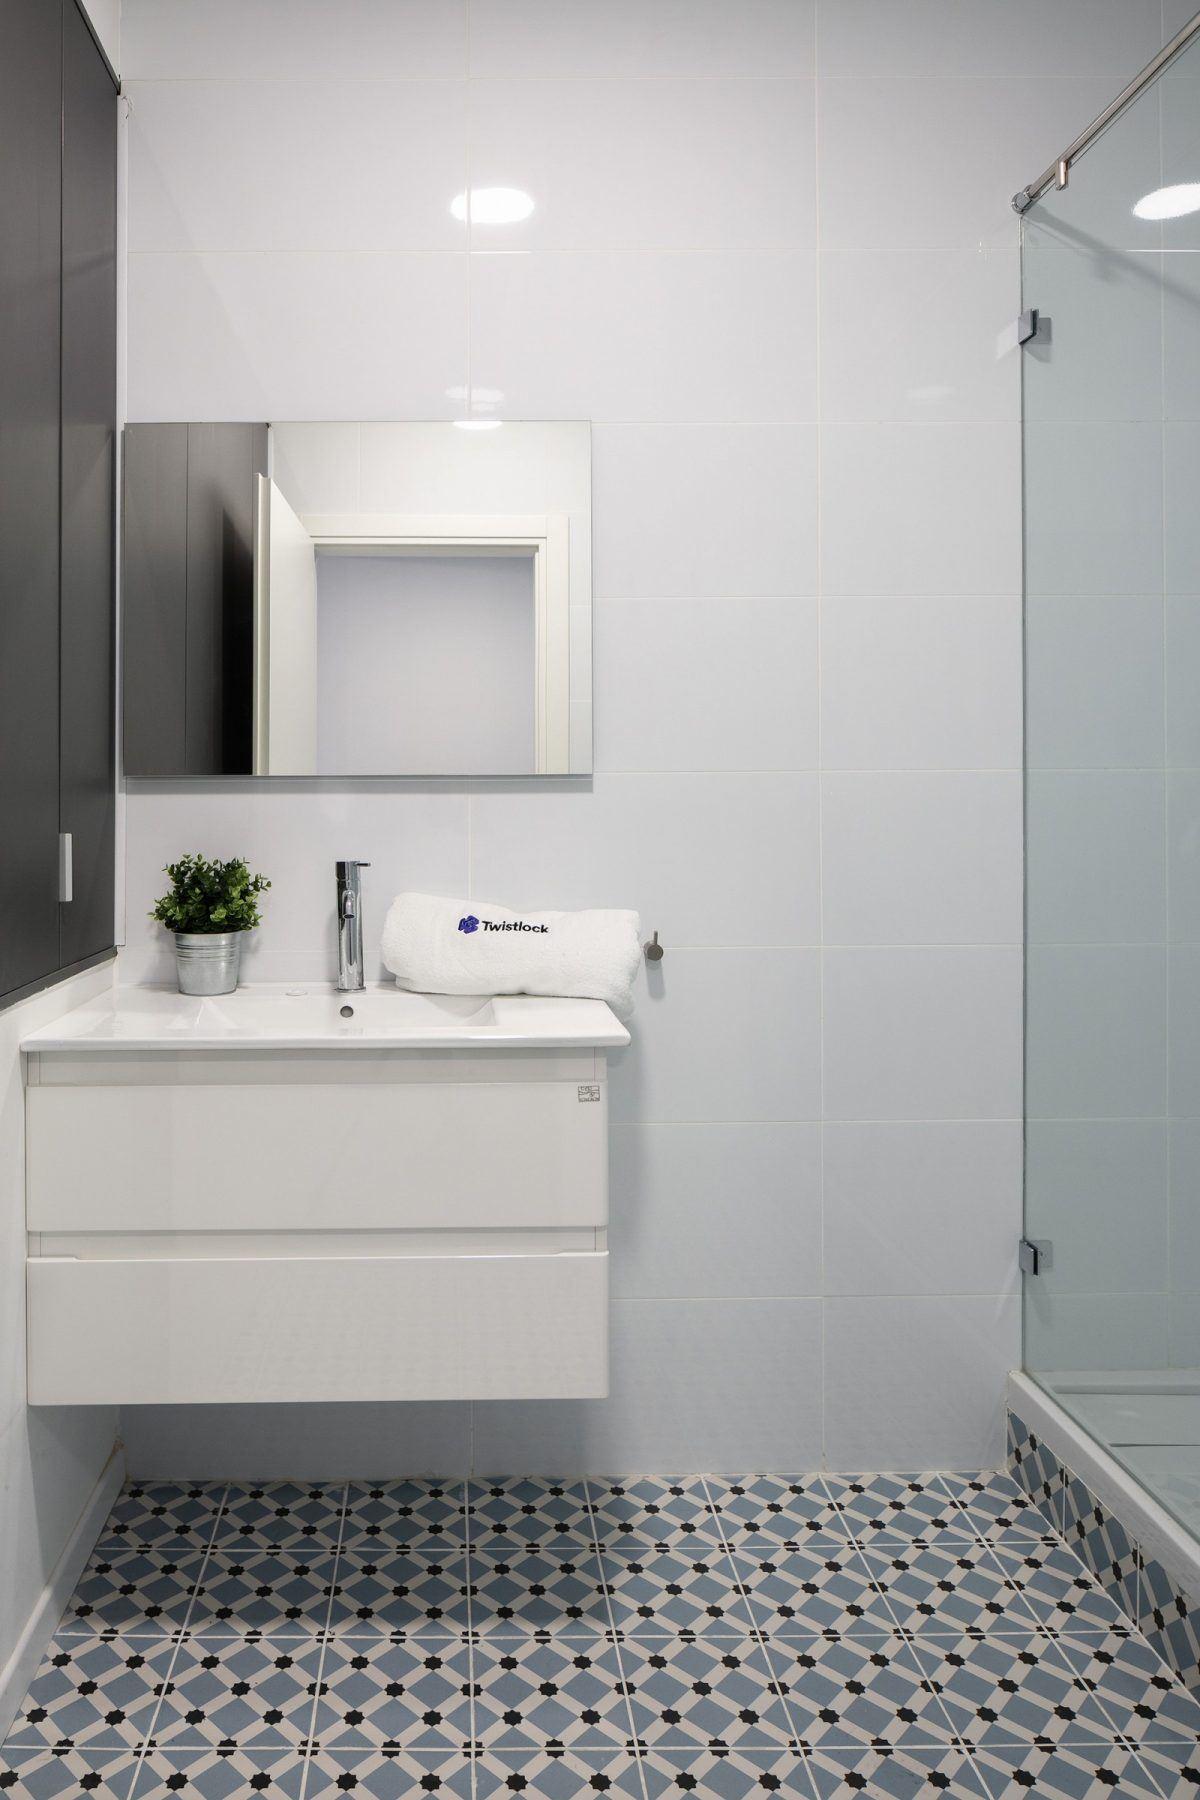 Twistlock Office Space גופי תאורה מעל כיור בחדר האמבטיה בביצוע של קמחי דורי